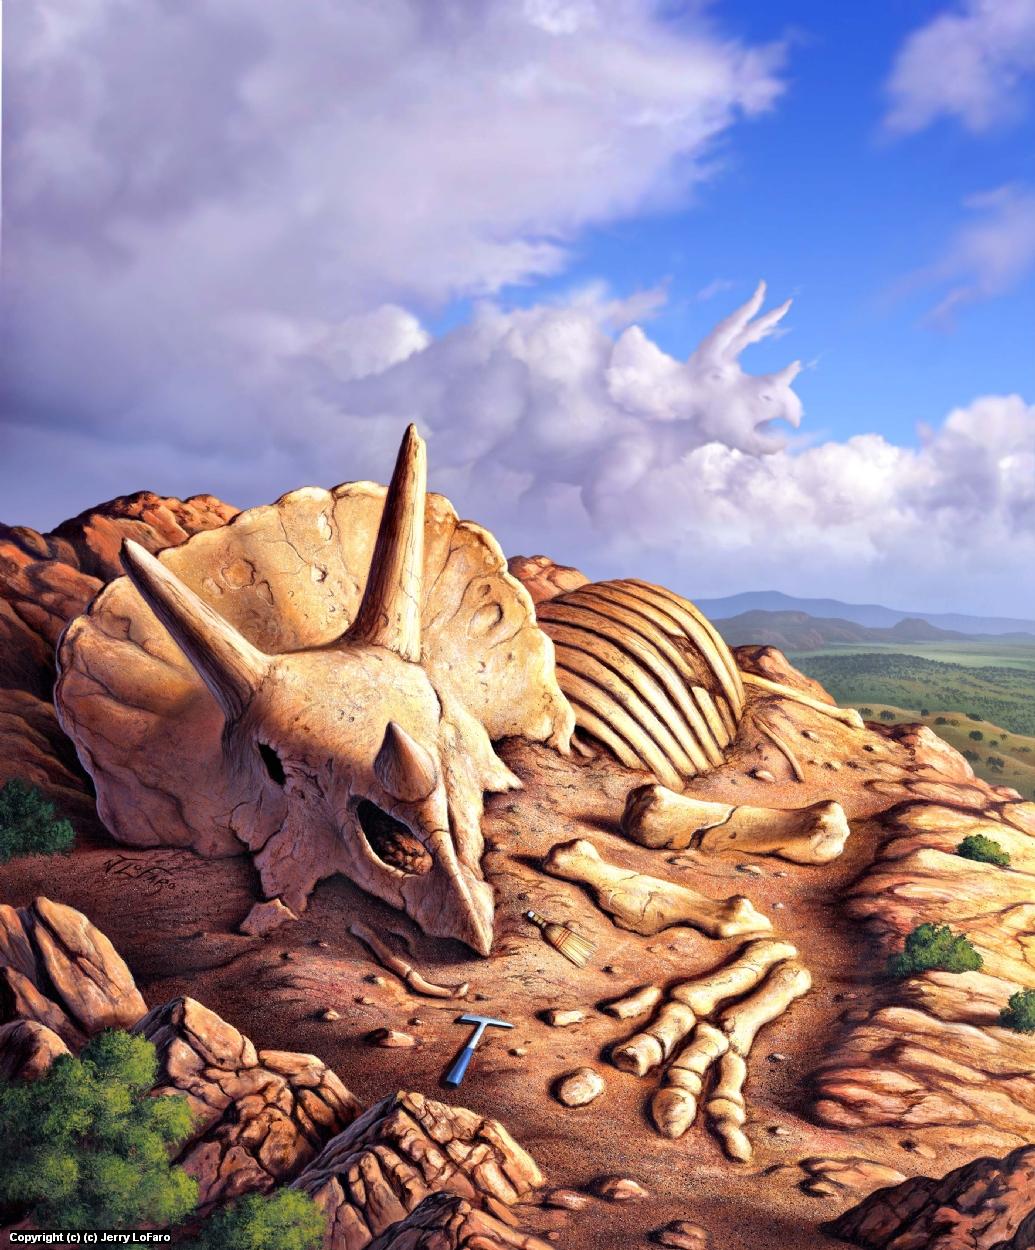 Dino Dig Artwork by jerry lofaro